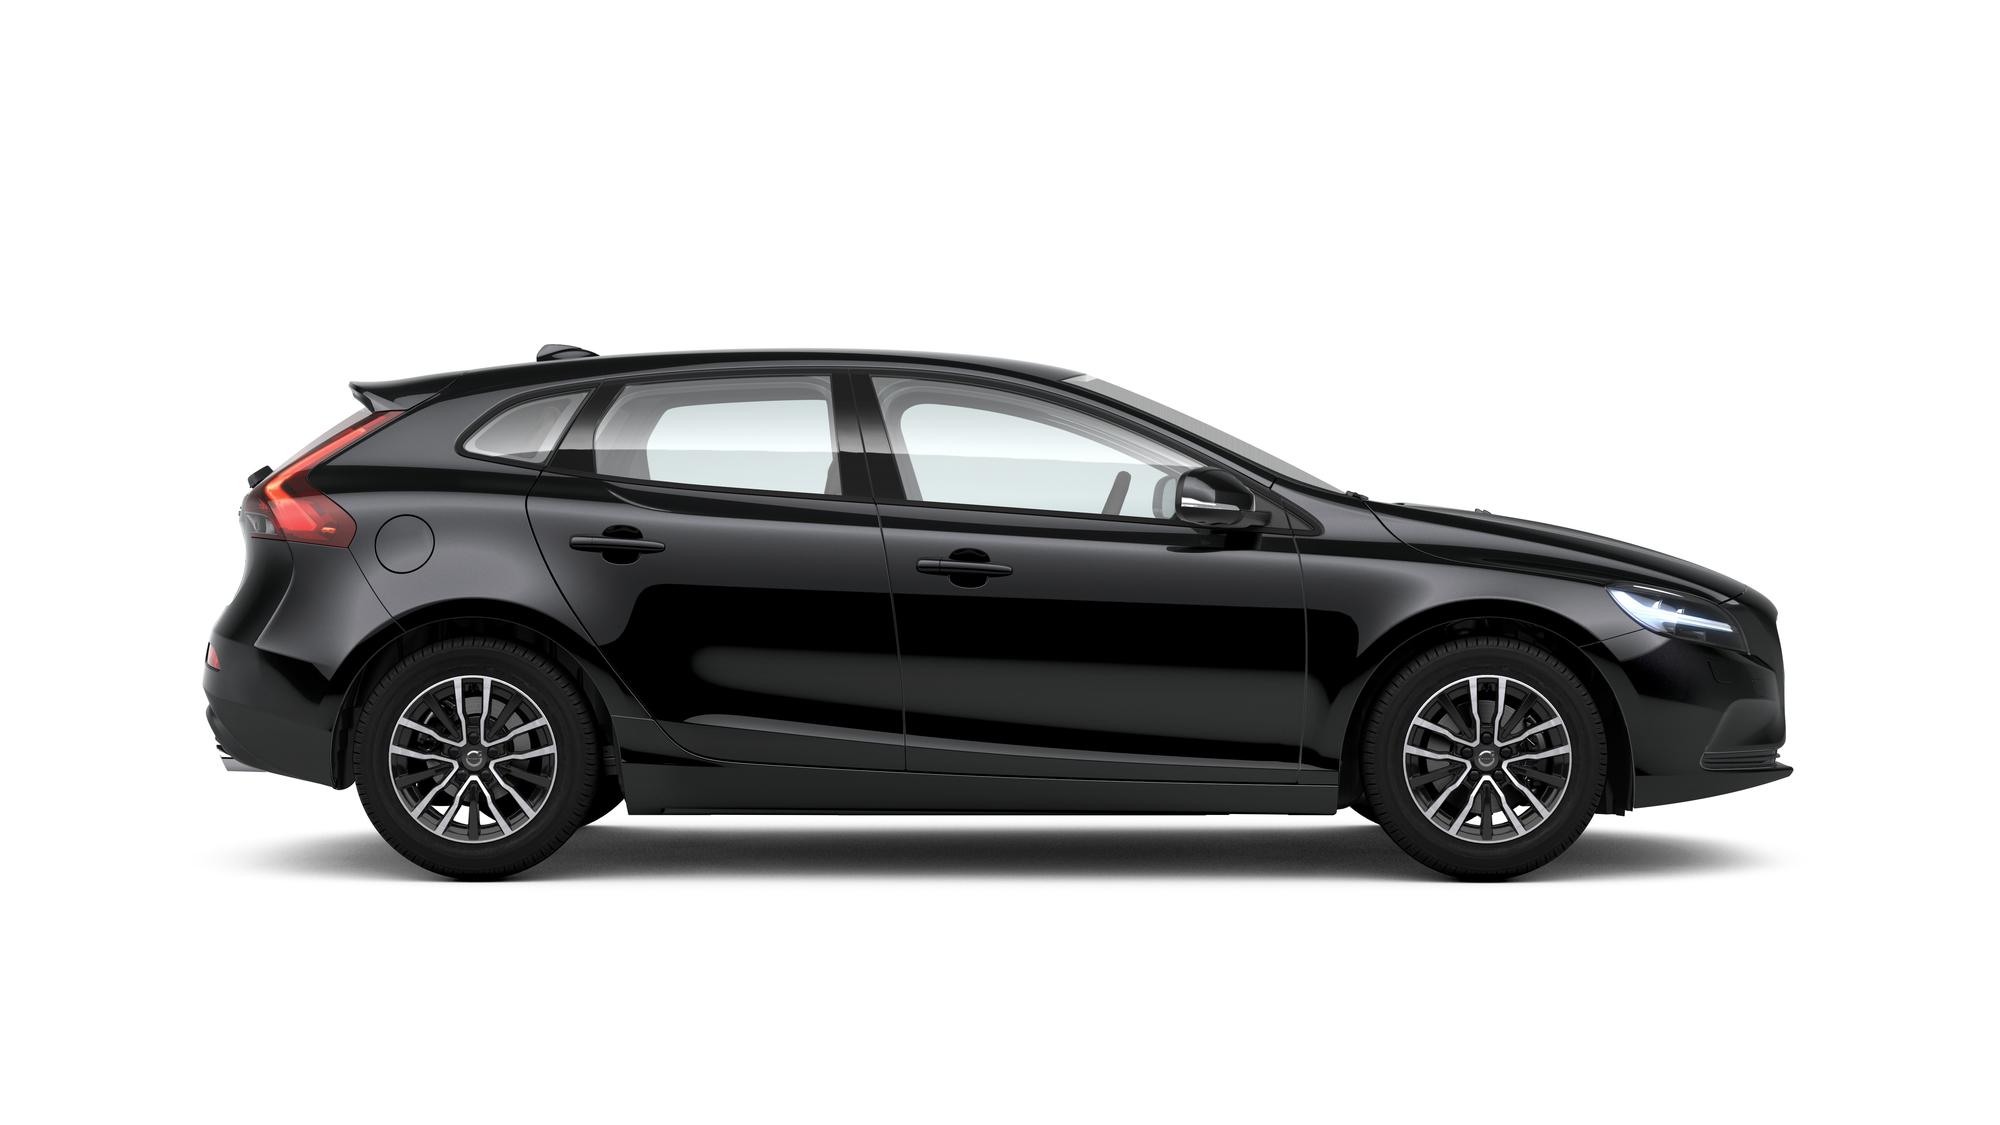 Side photo of the Volvo V40 in Onyx Black